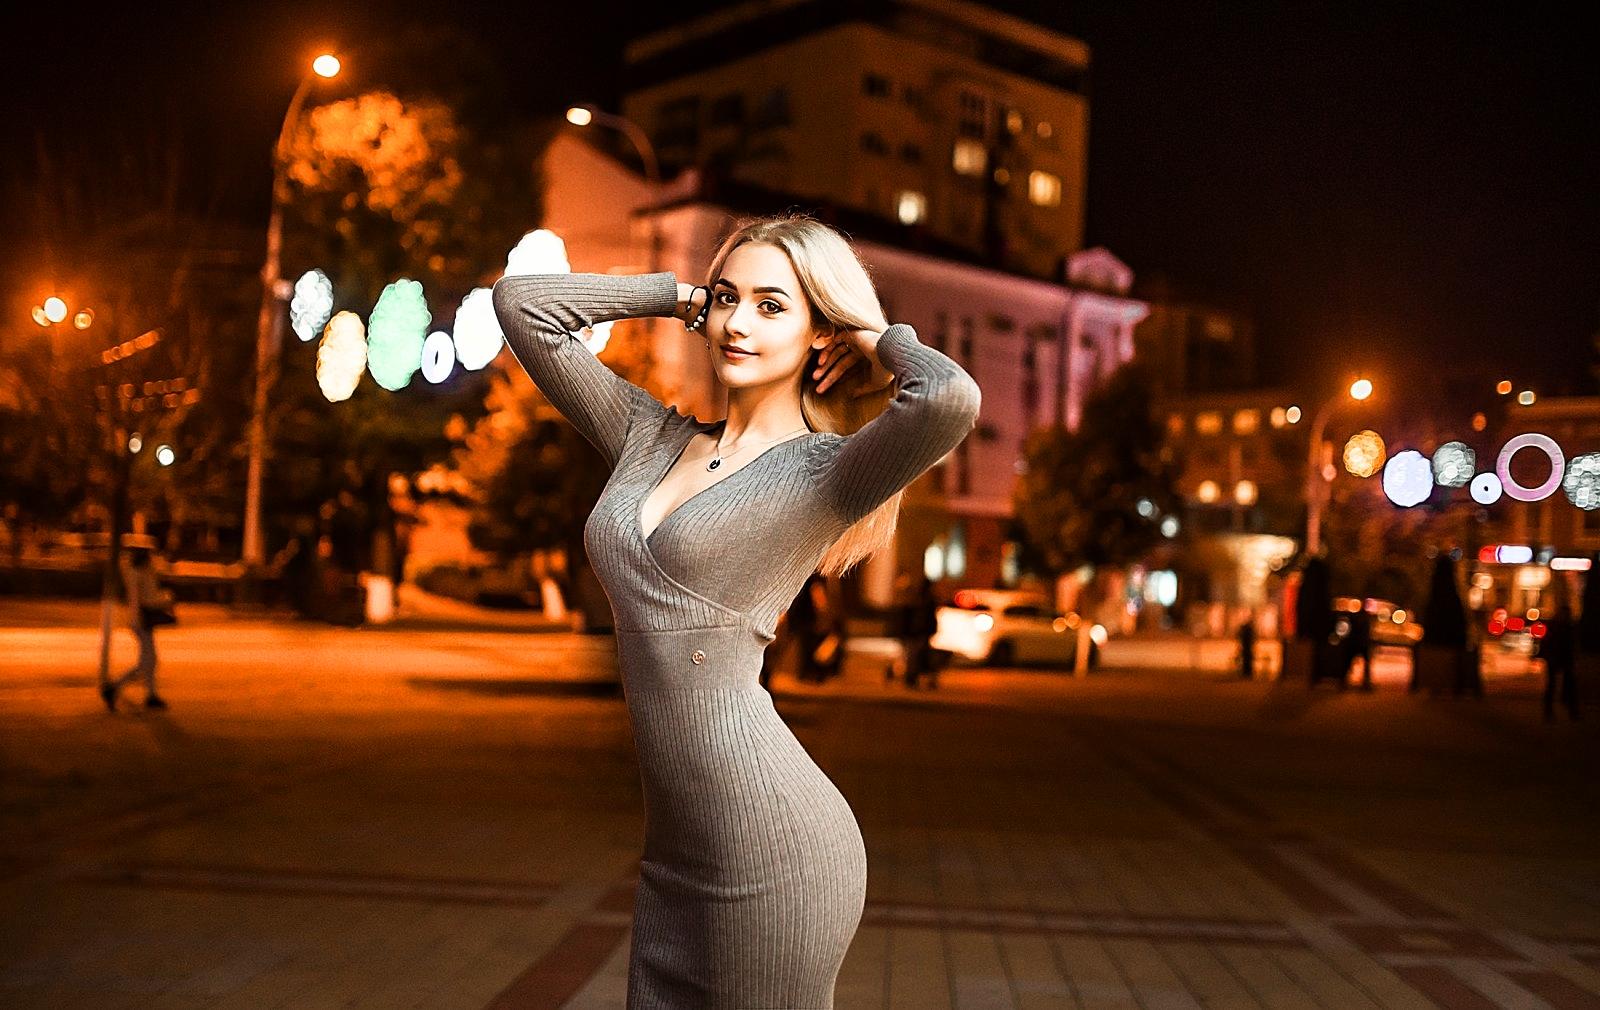 Wallpaper Blond Hair Longhair Model Blonde Fashion